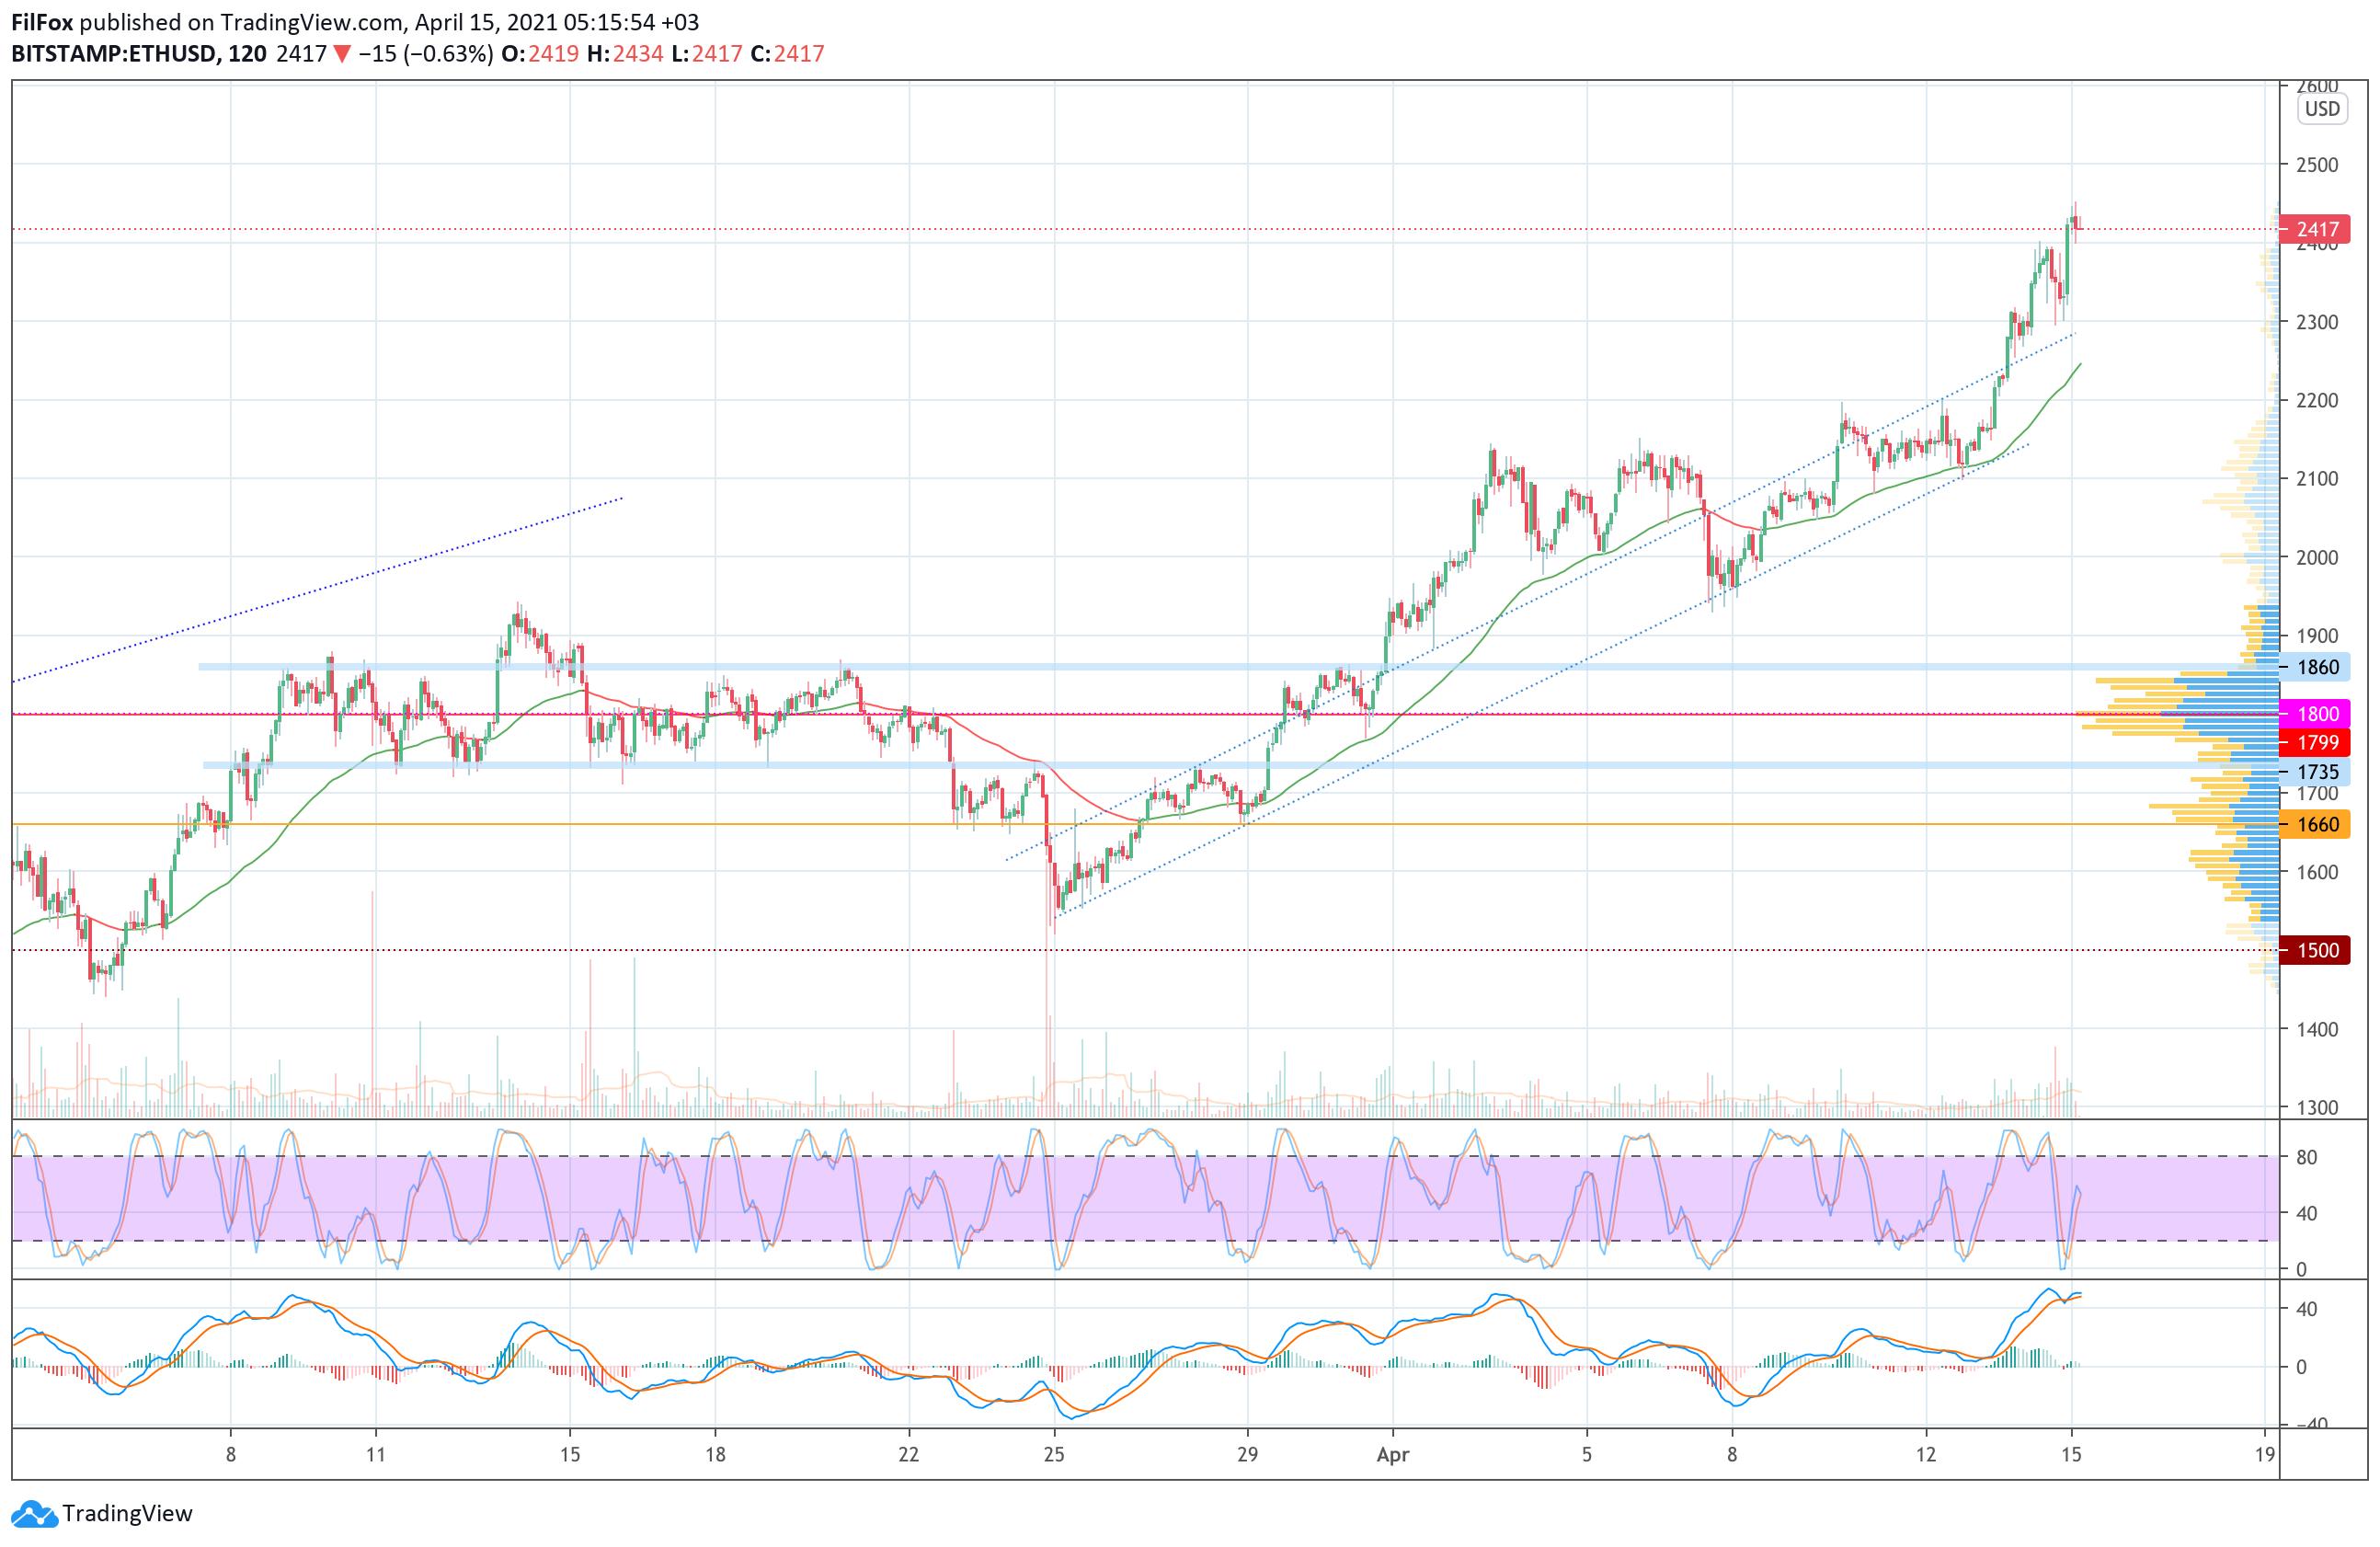 006695 - Анализ цен Bitcoin, Ethereum, XRP на 15.04.2021